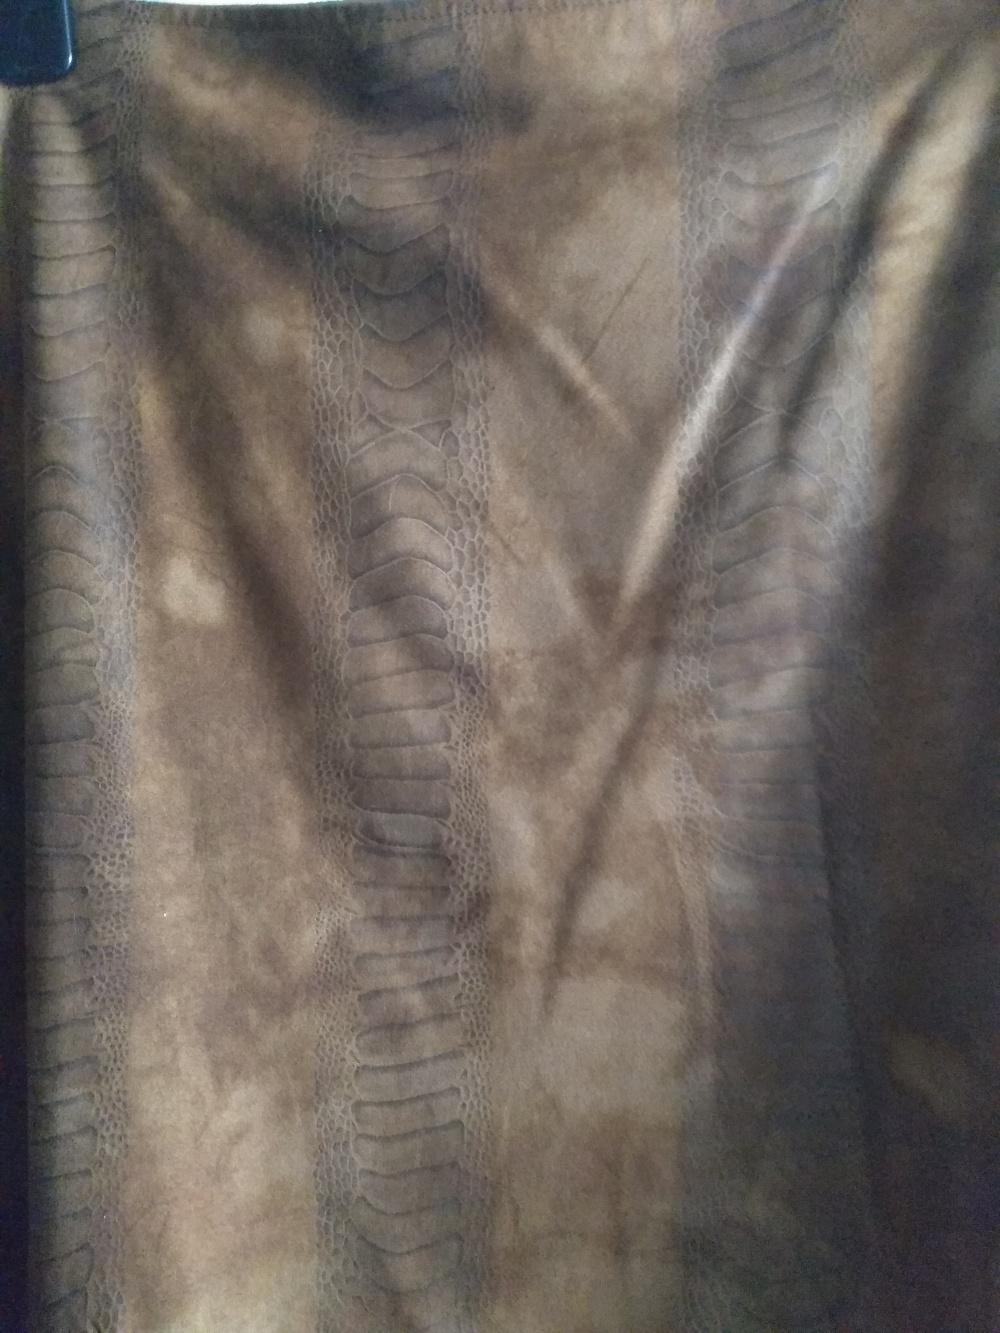 Юбка Rosemary, размер 54-56 (рос)